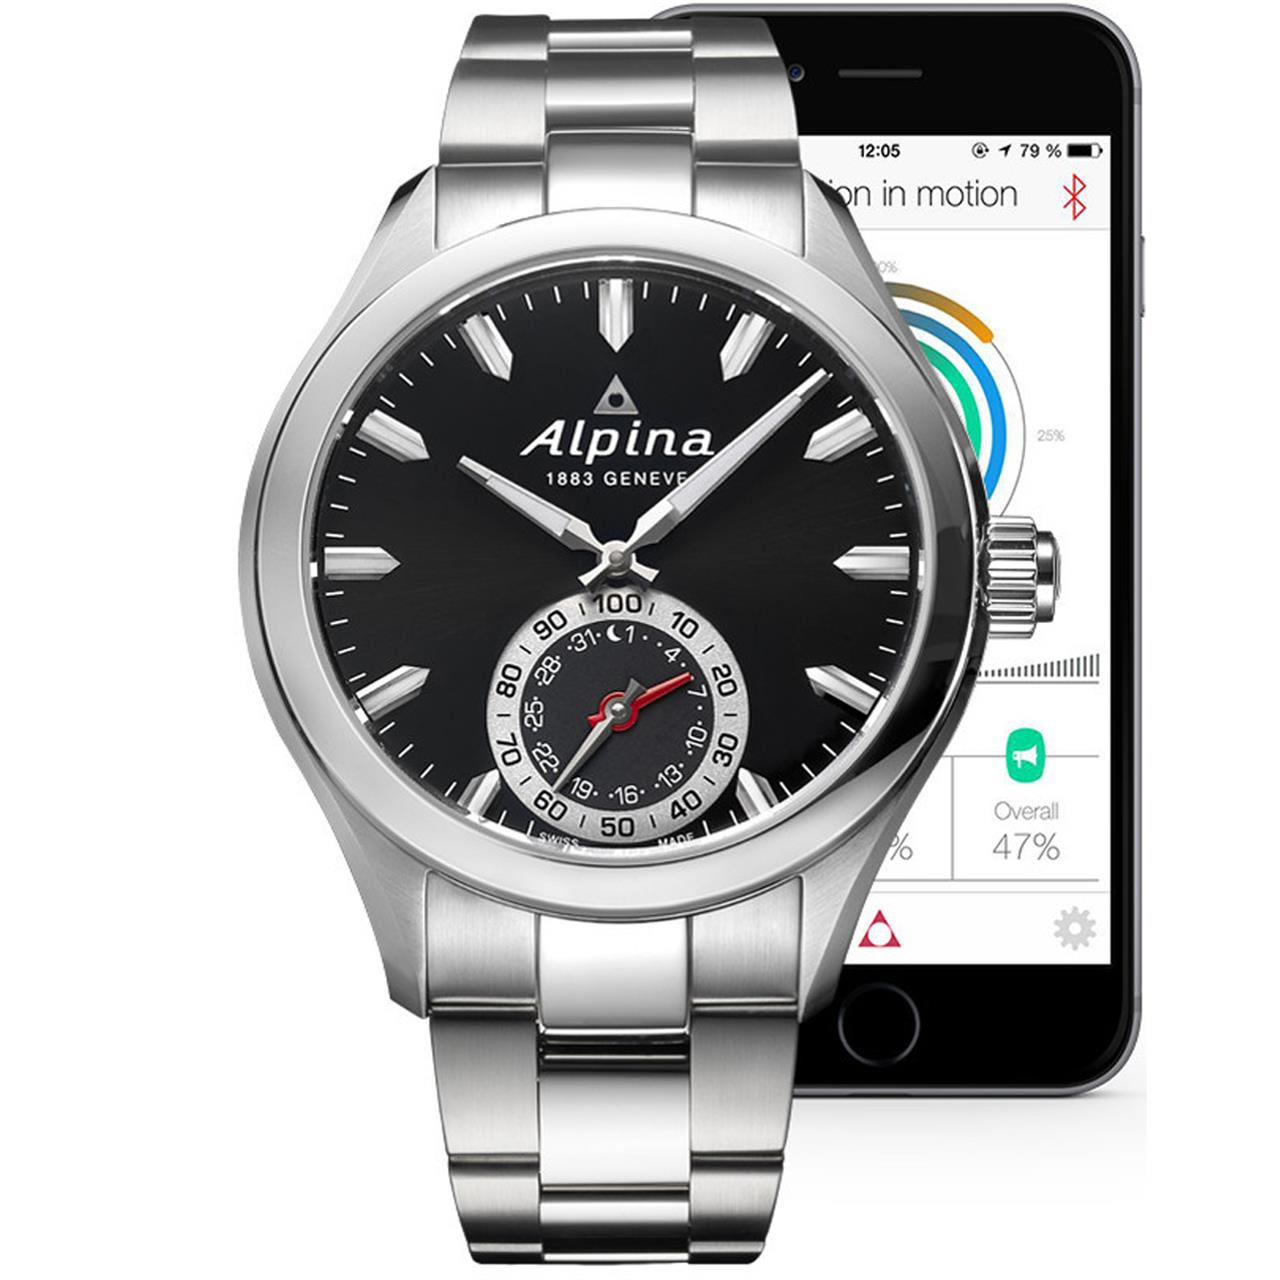 alpina smartwatch franzen d sseldorf onlineshop. Black Bedroom Furniture Sets. Home Design Ideas